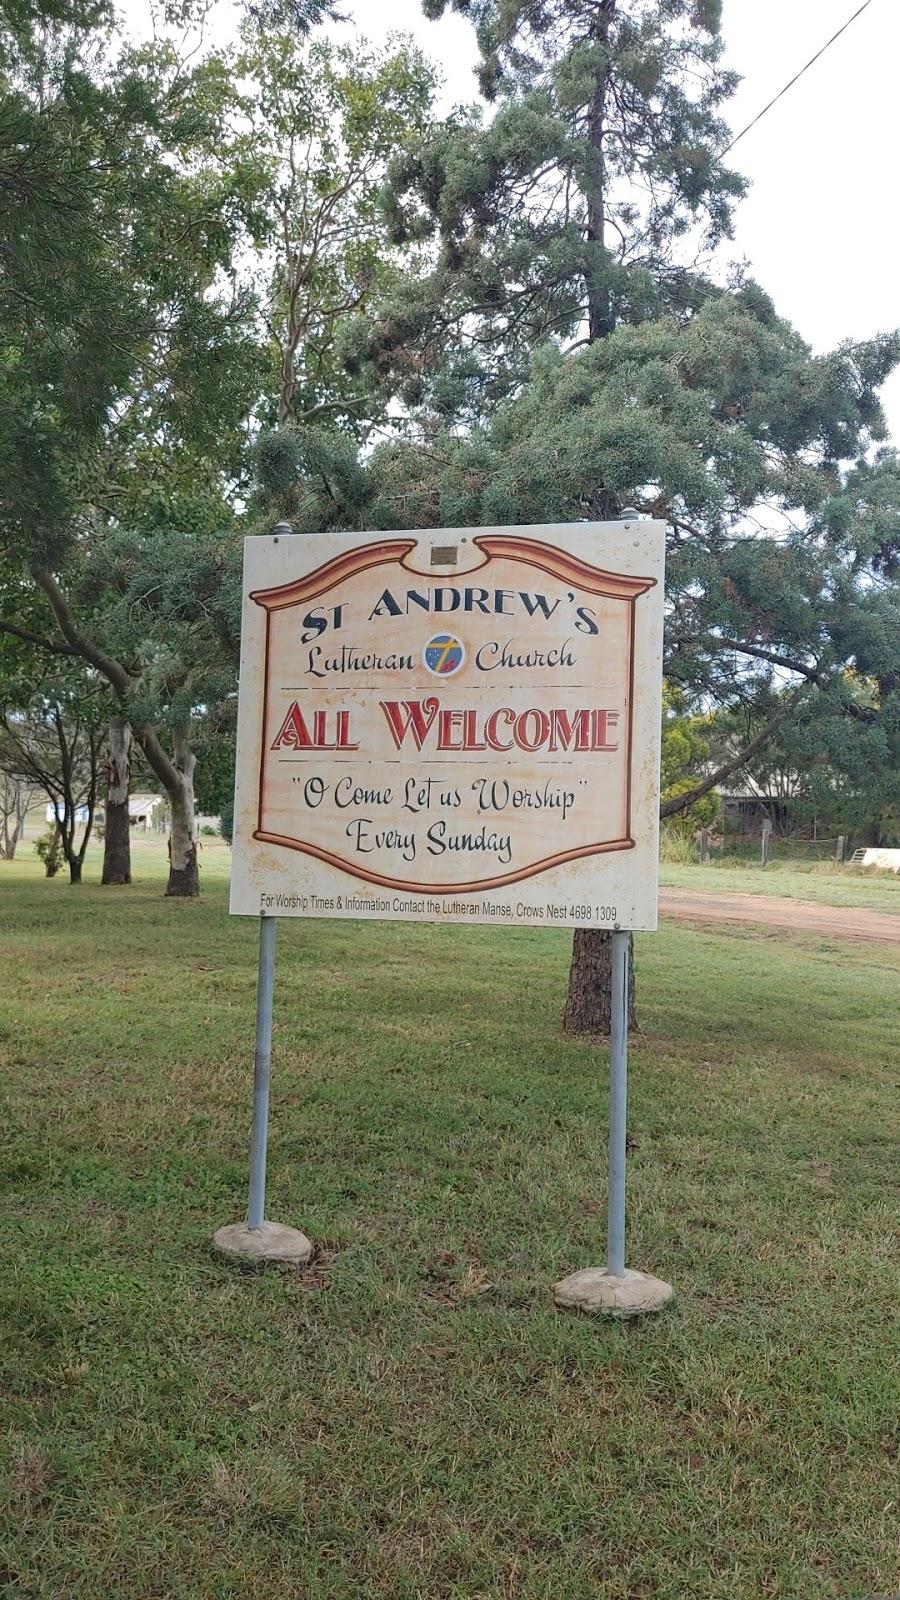 St. Andrews Lutheran Church | church | 17 Malcolm St, Cooyar QLD 4402, Australia | 0404067454 OR +61 404 067 454